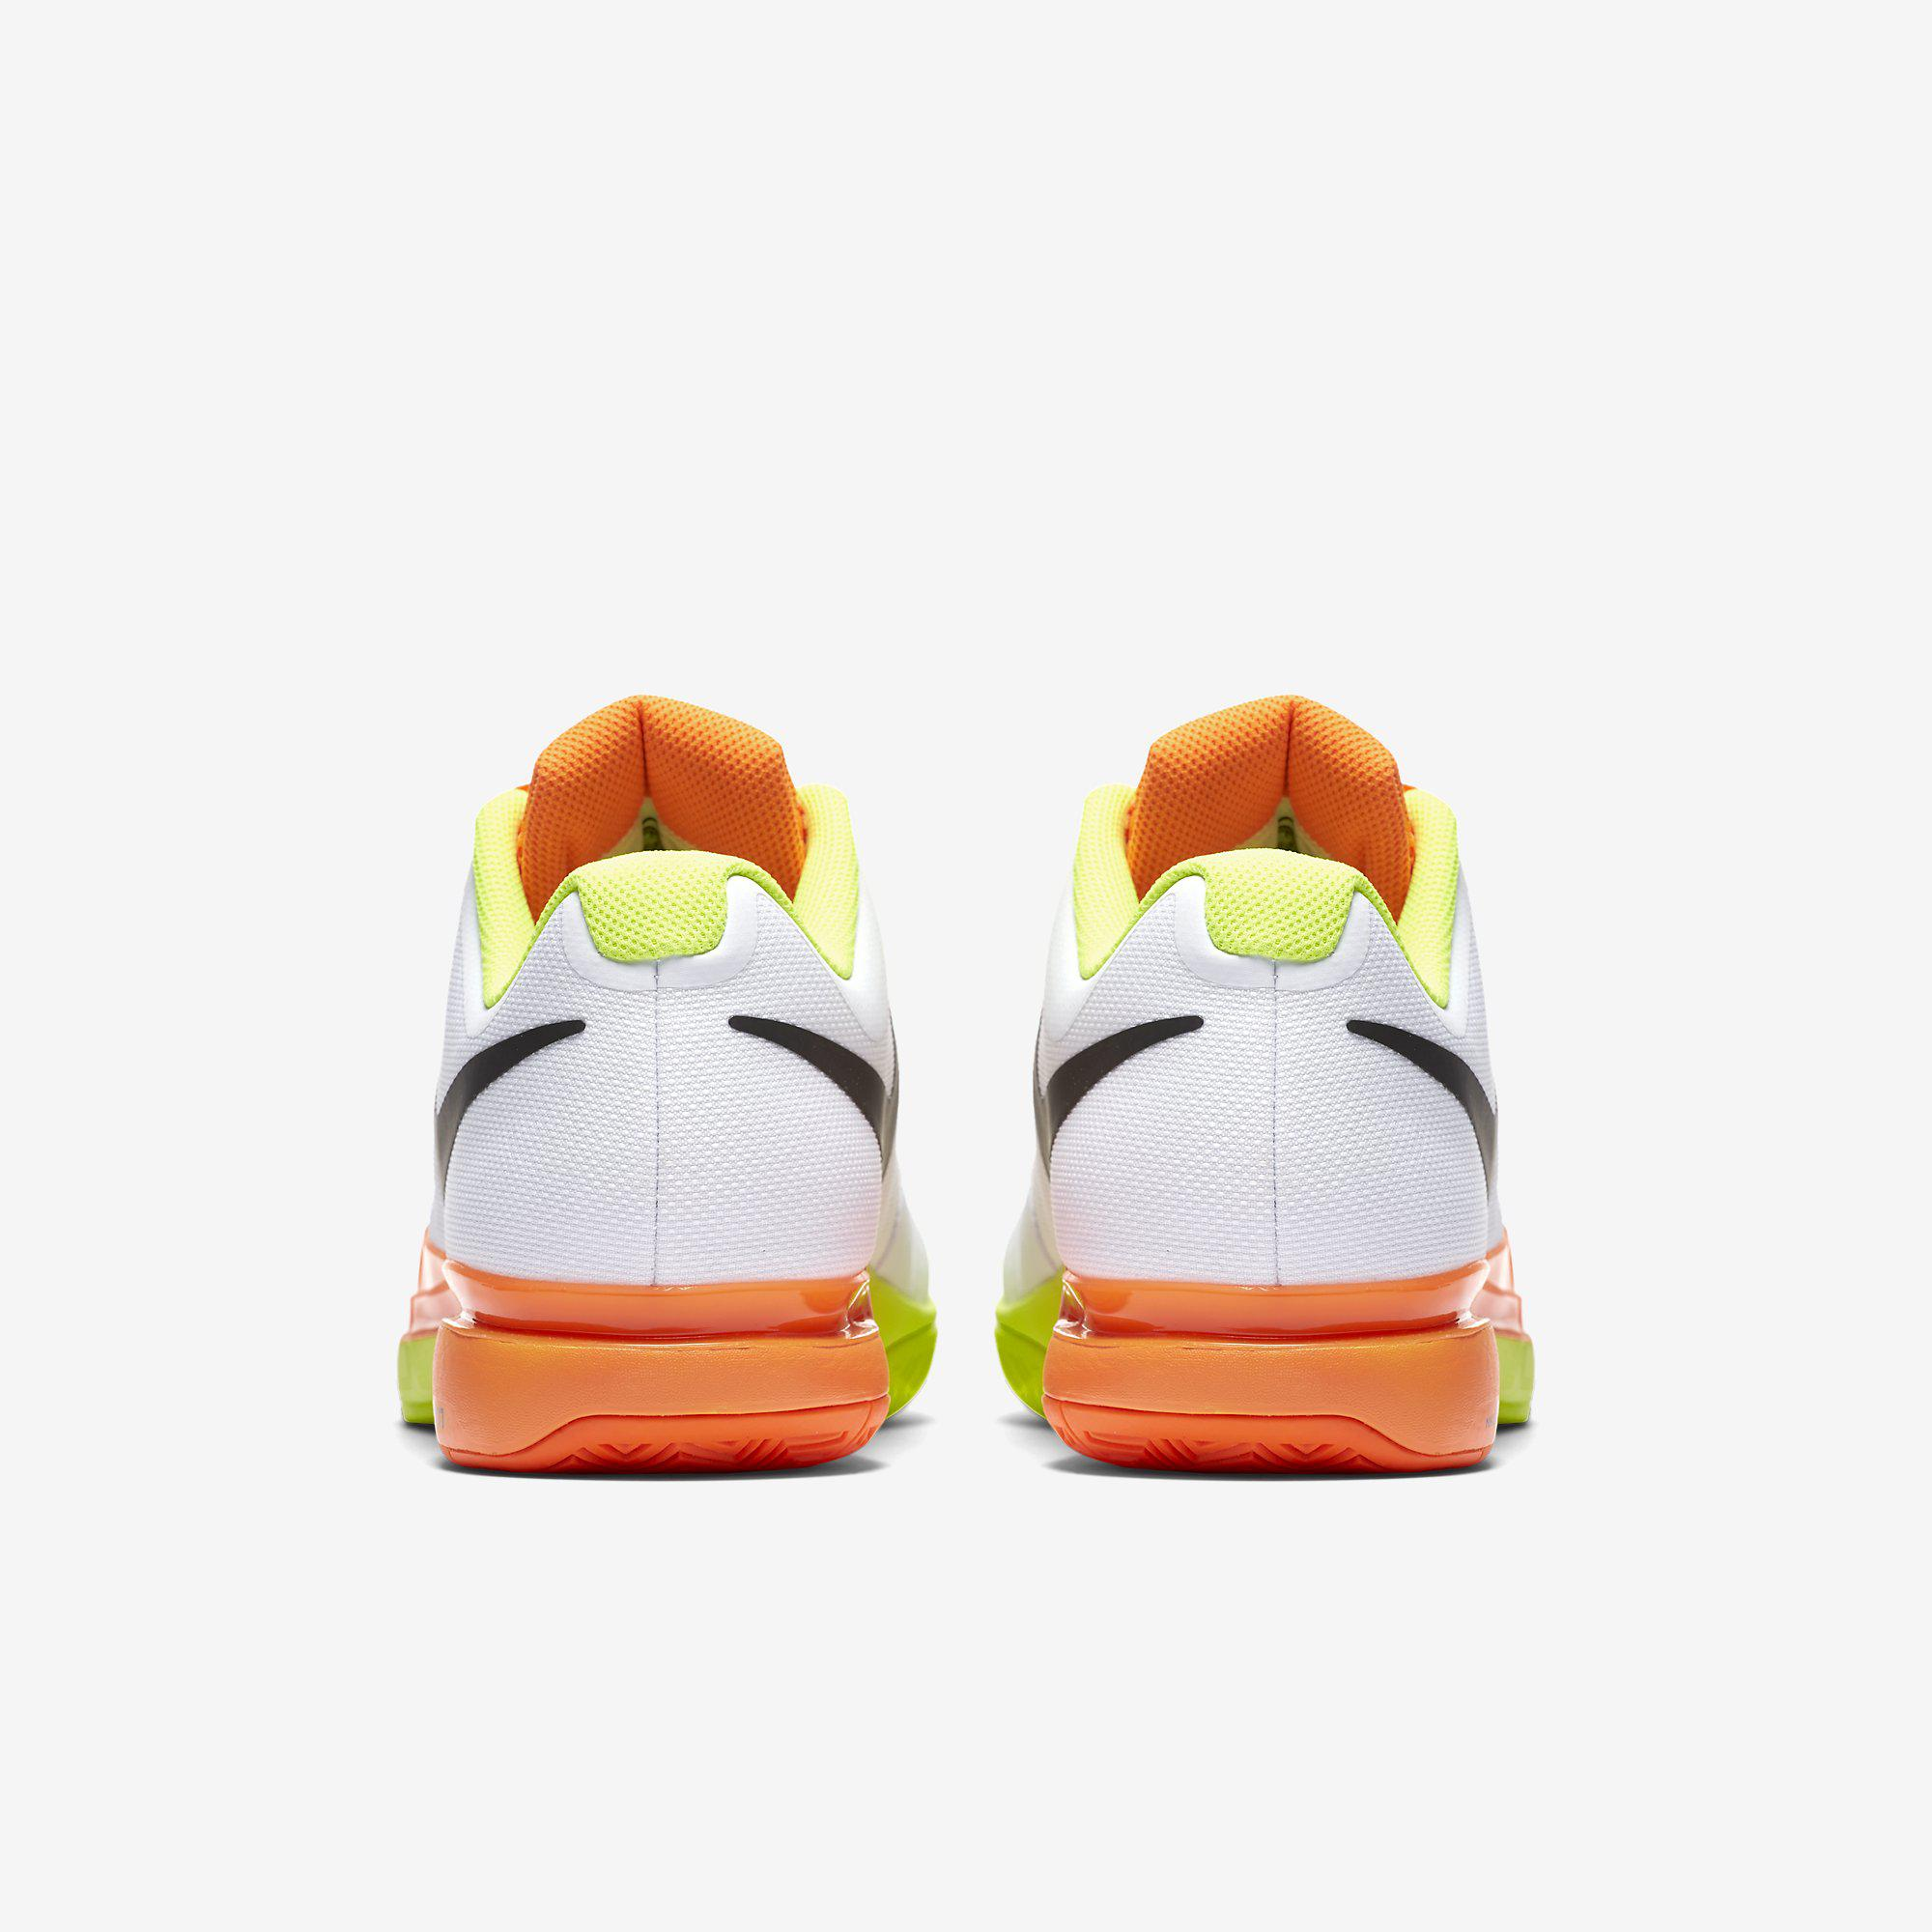 c7645a123e3ec Nike Mens Zoom Vapor 9.5 Tour Tennis Shoes - White Orange Volt ...